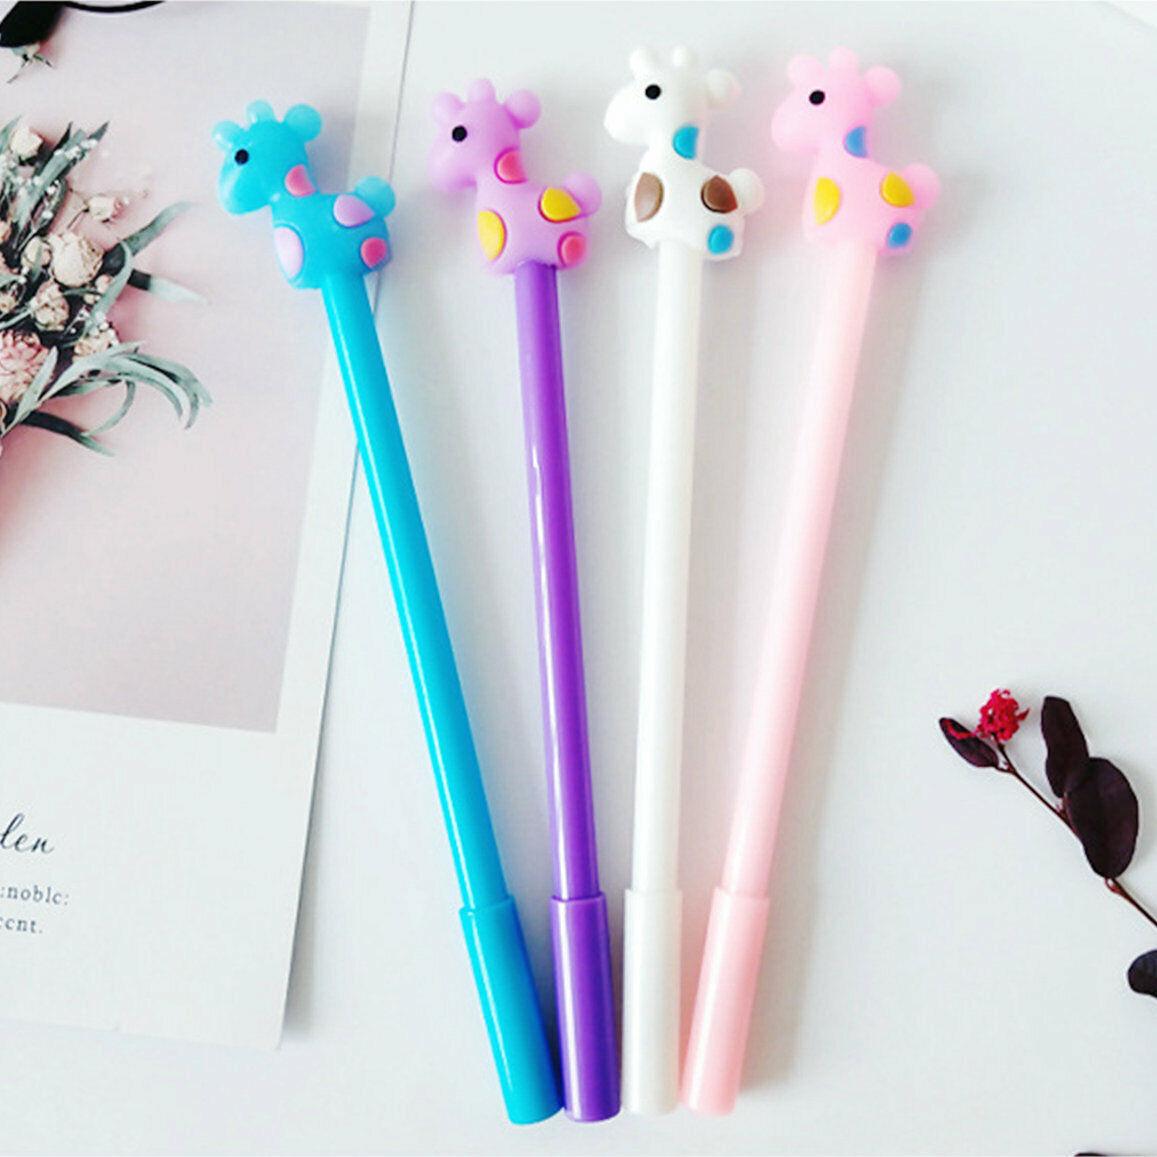 8pcs Cute Cartoon Kawaii Colorful Animal Fish bone Gel Ink Ball Point Pen gifts